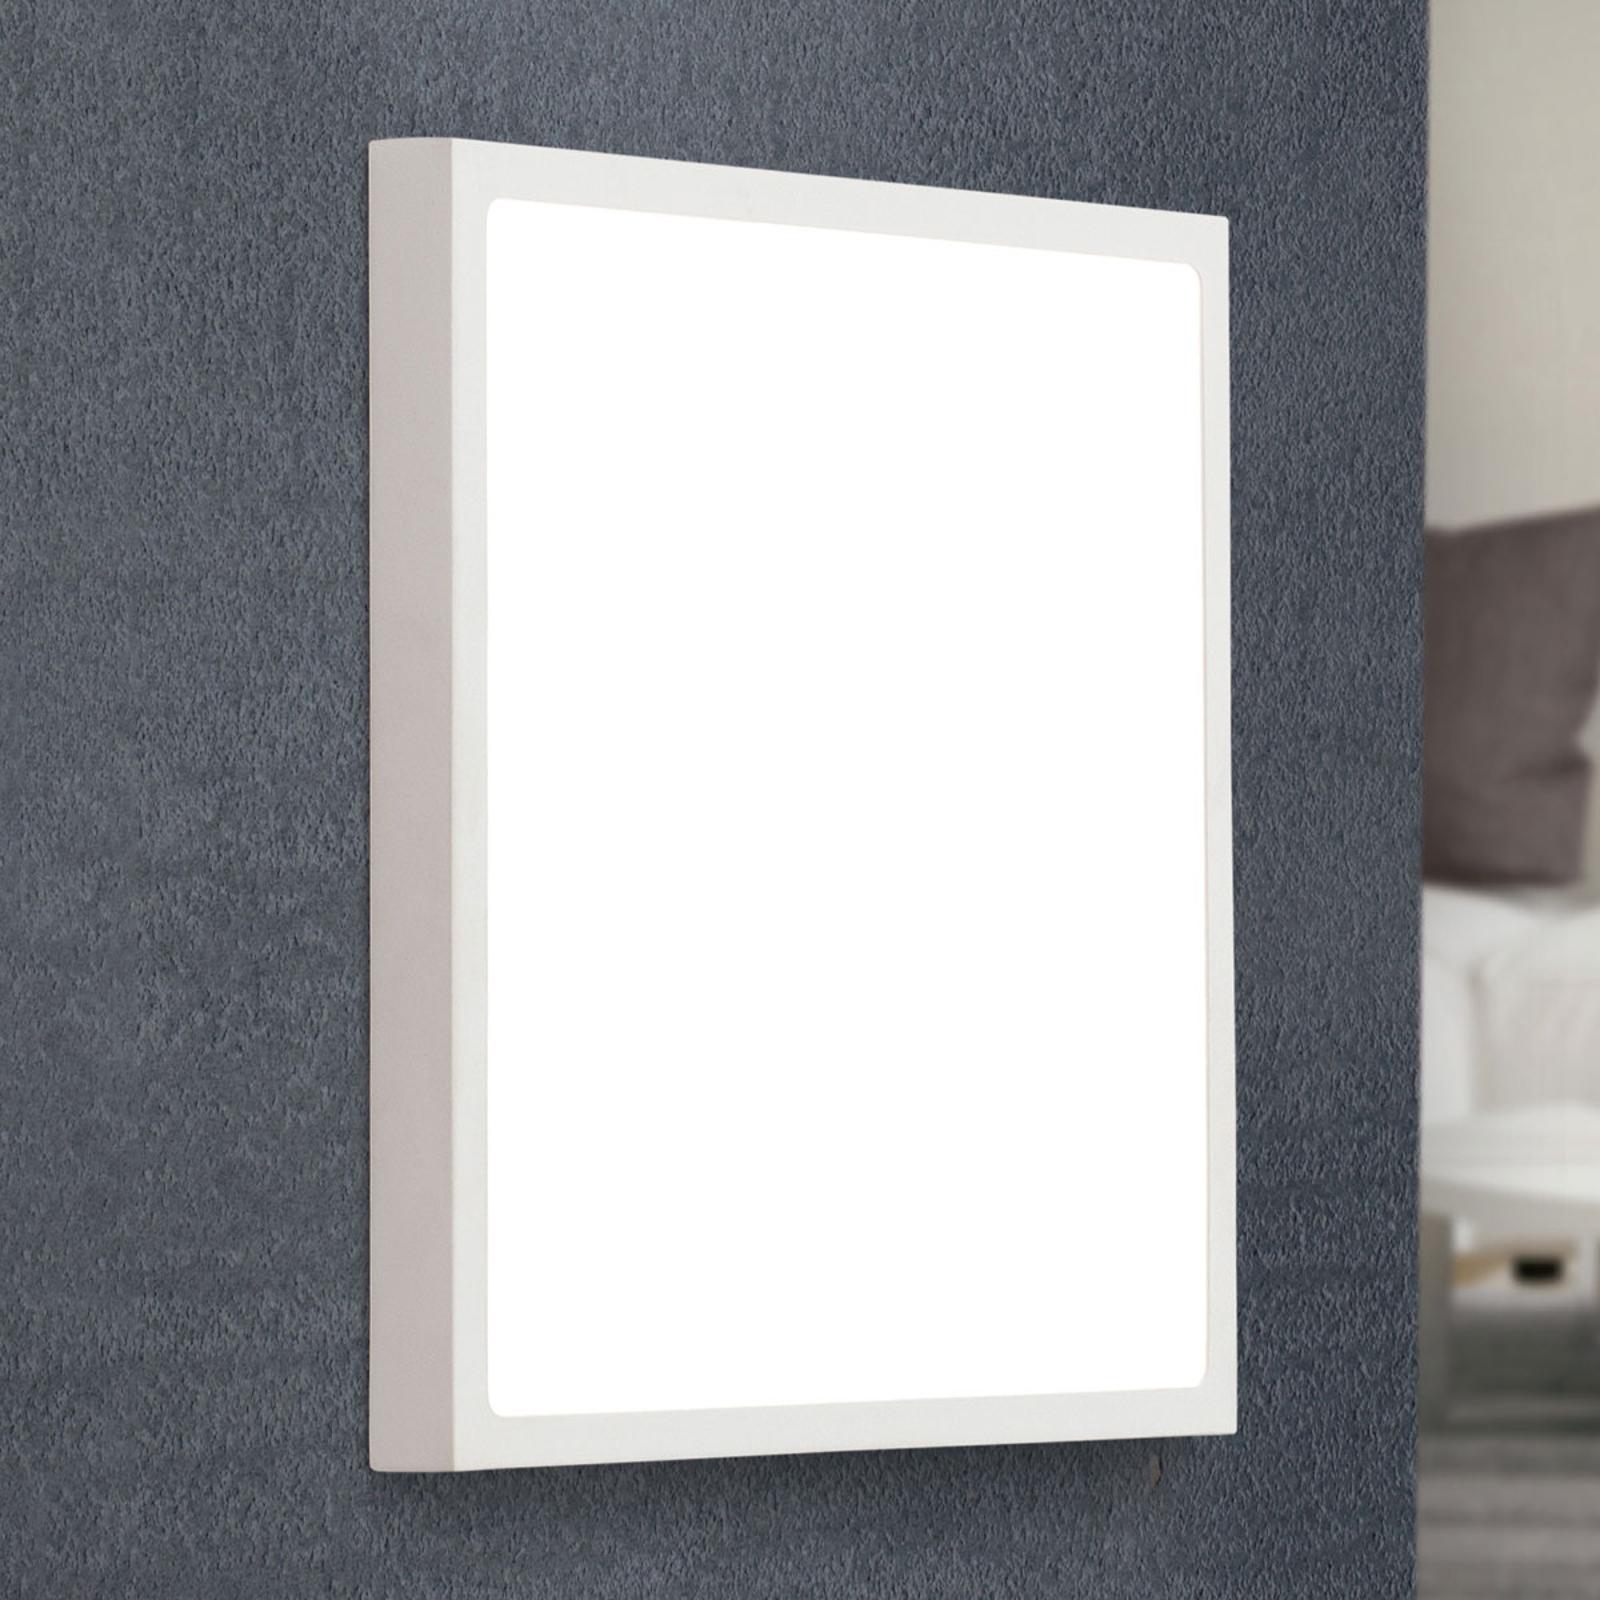 Lampa sufitowa LED Vika, kwadratowa, 30 cm